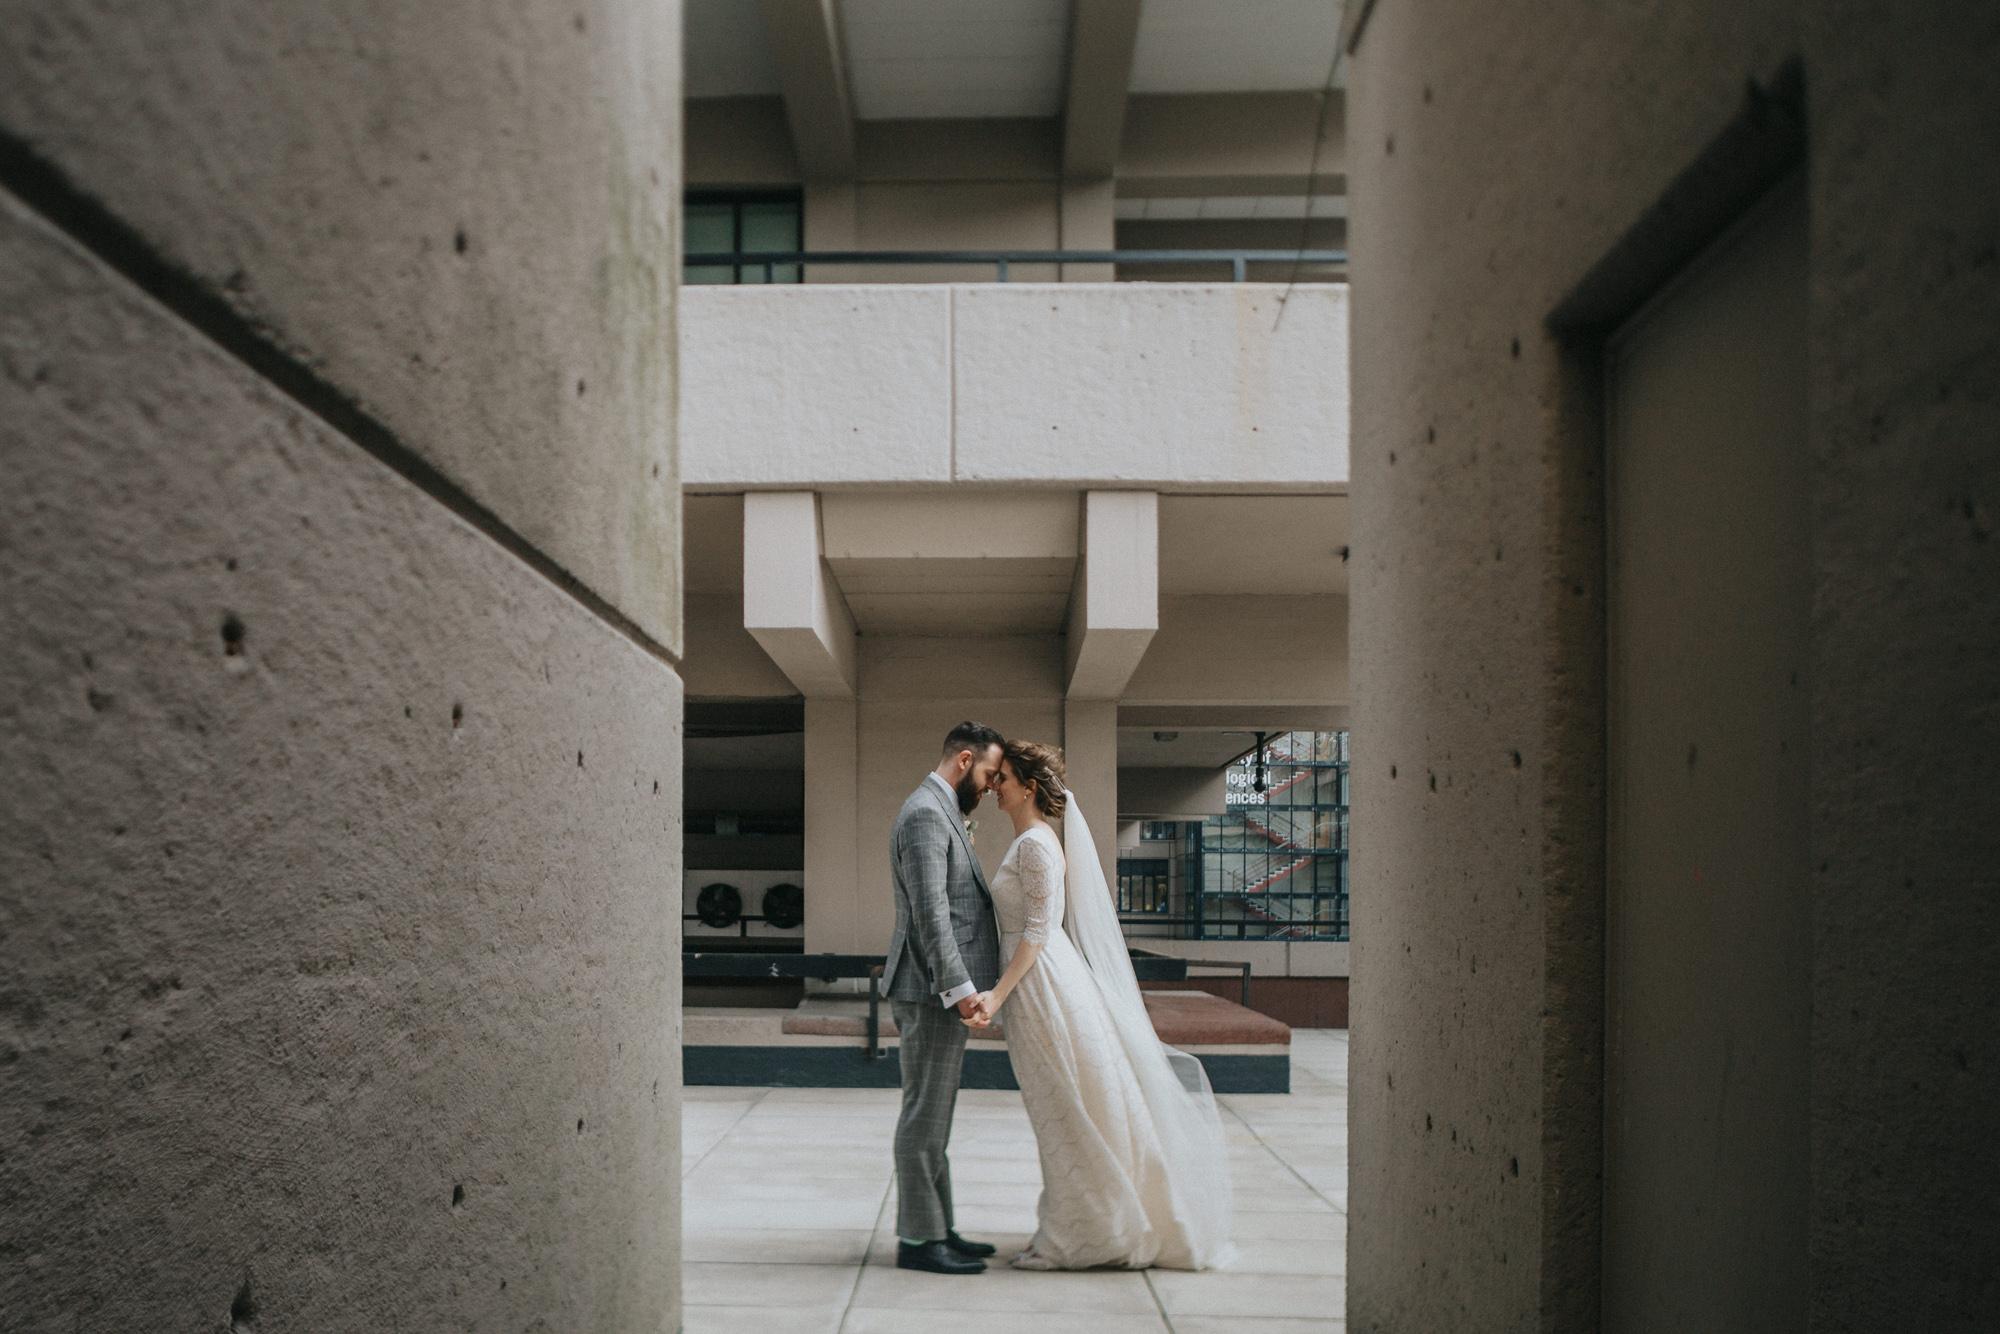 Kate-Beaumont-Lace-Flared-Dahlia-Gown-Leeds-Wedding-Bloom-Weddings-56.jpg